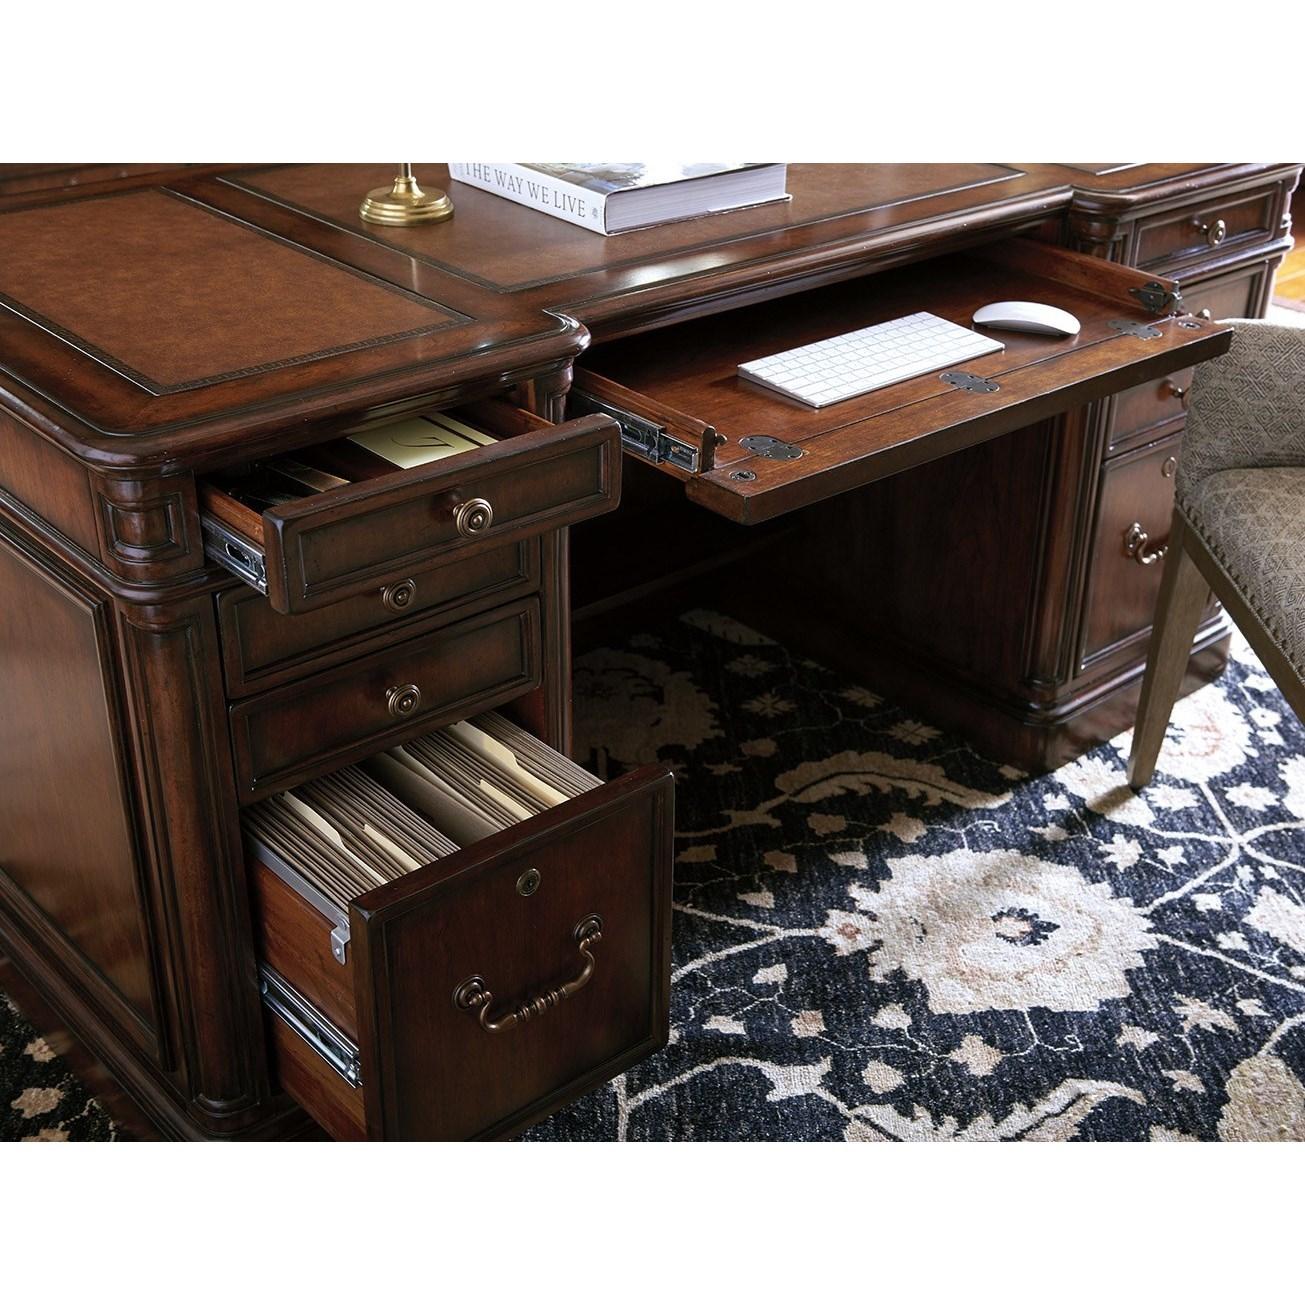 leather sofa richmond hill apollo motion reviews sligh morgan executive desk with faux